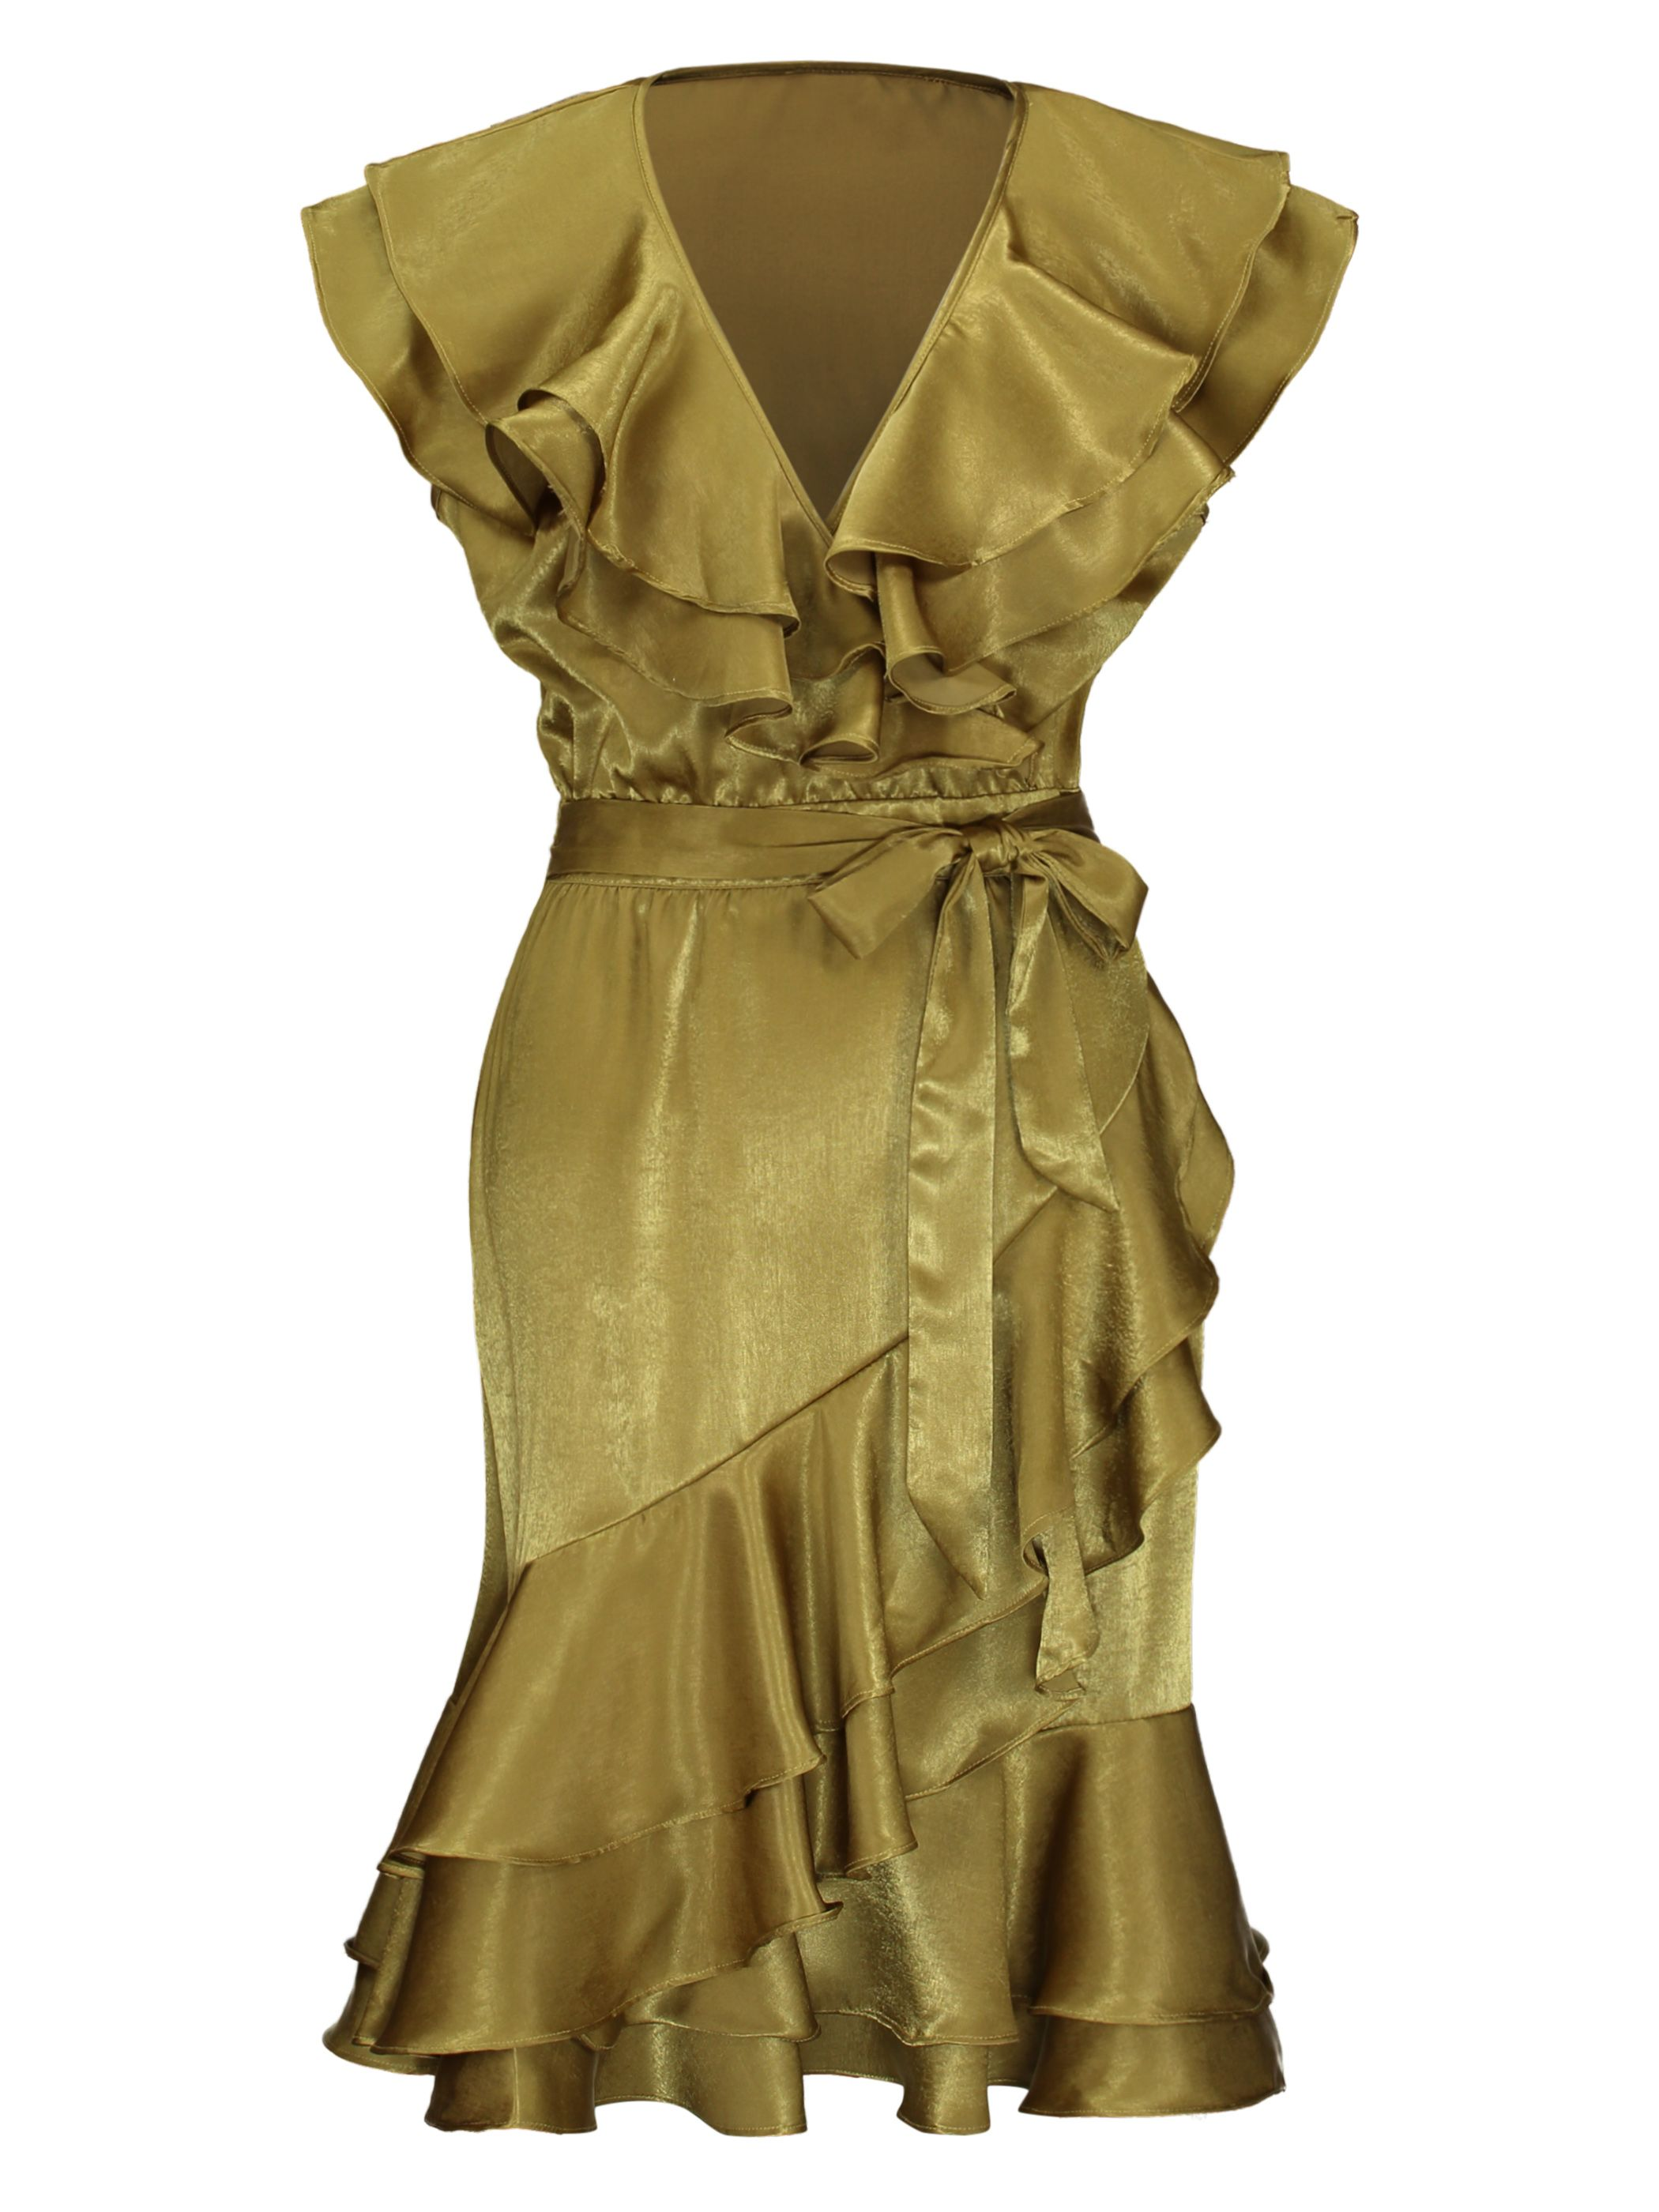 Plus size pin up style wedding dress  Falbala Patchwork Asymmetrical Day Dress  Patchwork